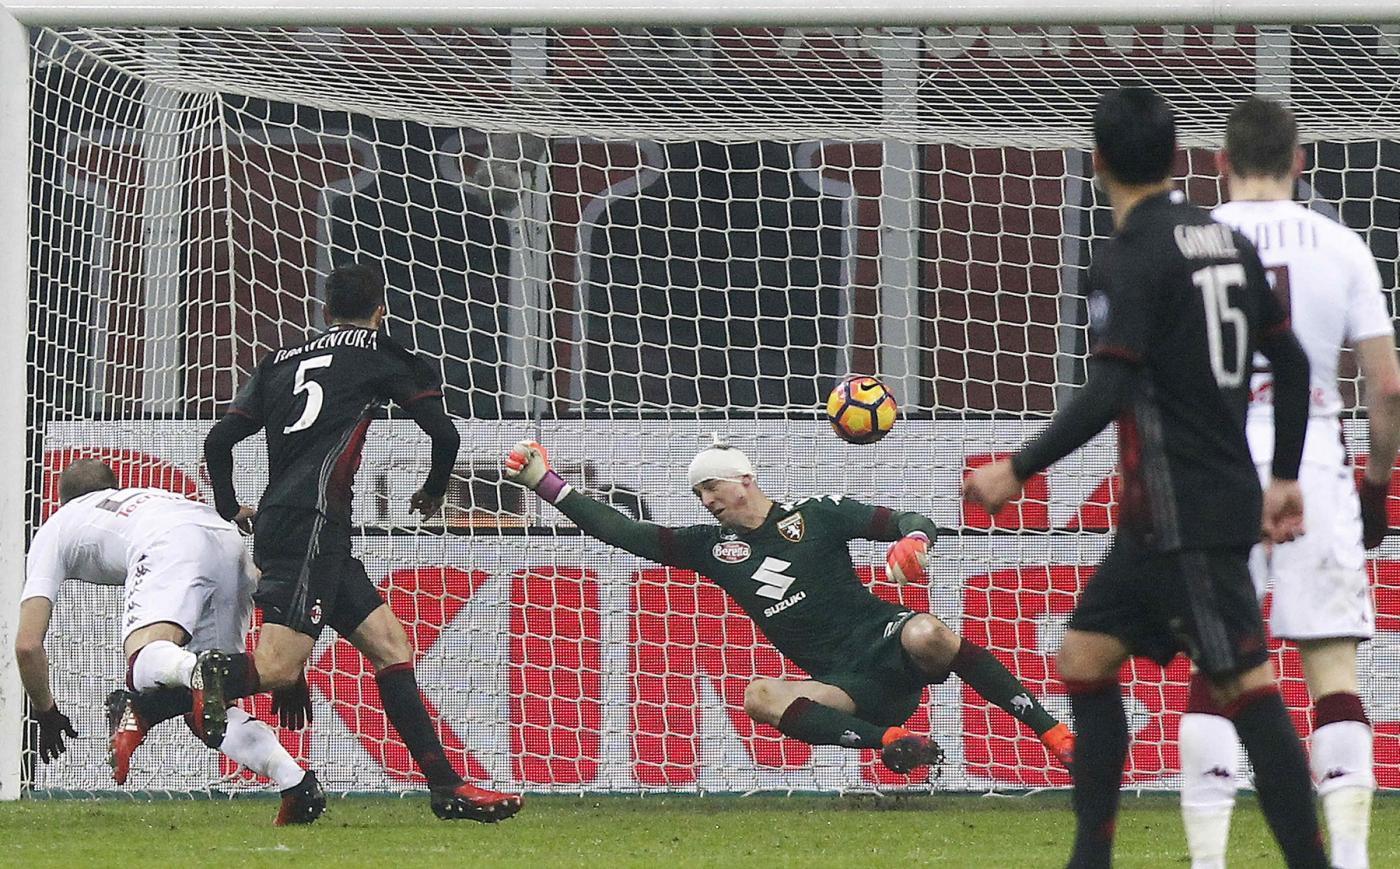 "Foto LaPresse/Spada12 Gennaio 2017 Milano (Italia) Sport Calcio Milan vs Torino - Coppa Italia TIM CUP 2016/2017ʭ Stadio ""Giuseppe Meazza"" Nella foto : Bonaventura gol 2-1Photo LaPresse/SpadaJanuary 12 , 2017 Milan (Italy)Sport SoccerMilan vs Torino - Italian Cup TIM CUP 2016/2017 - ""Giuseppe Meazza"" Stadiumʉn the pic: Bonaventura goal 2-1"